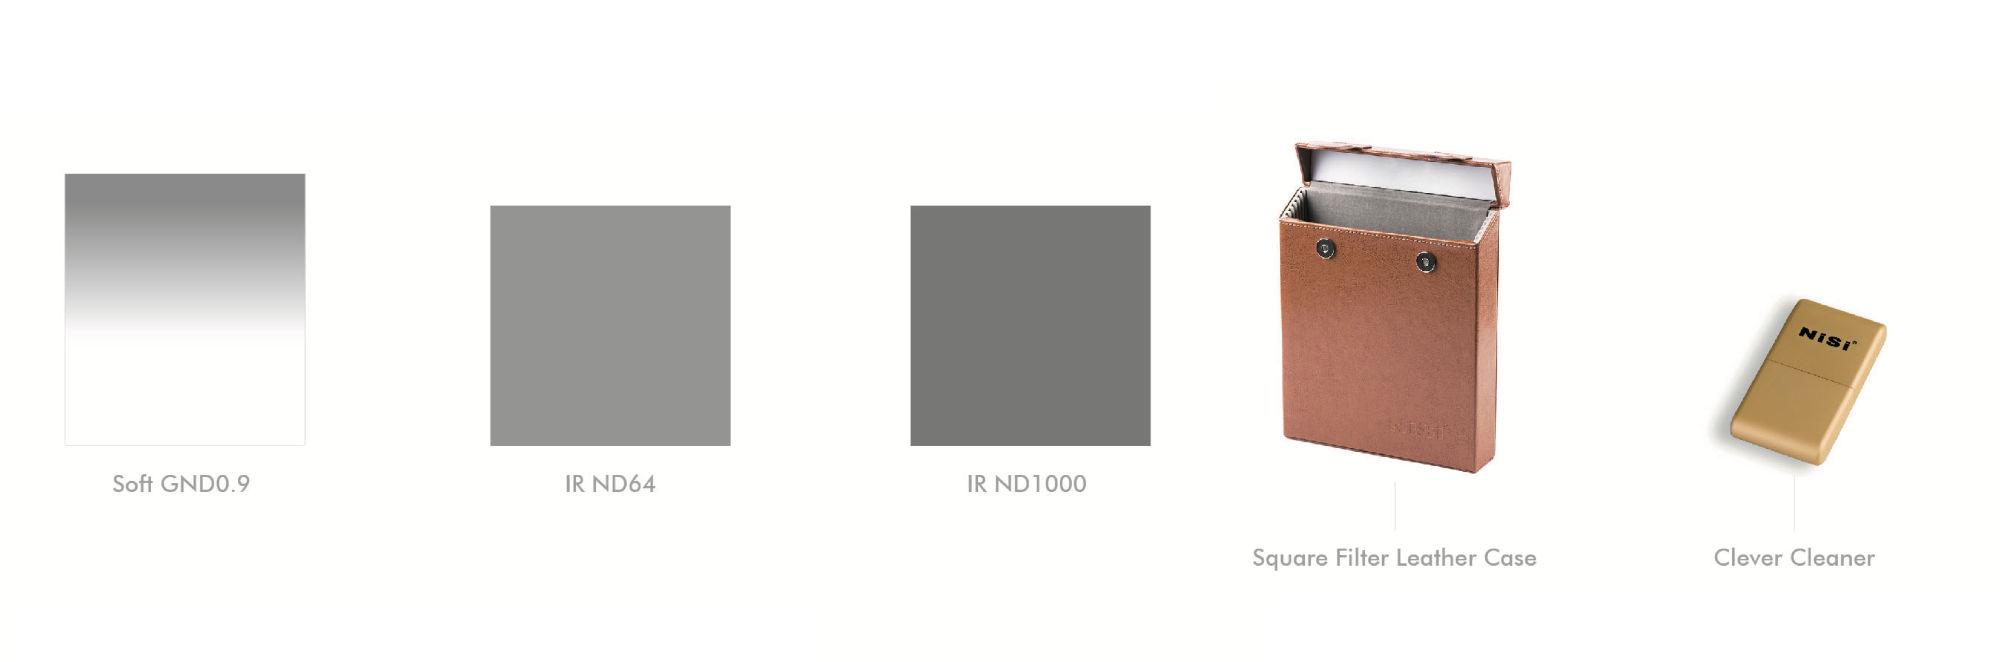 NiSi-150mm-STARTER-KIT-contents.jpg